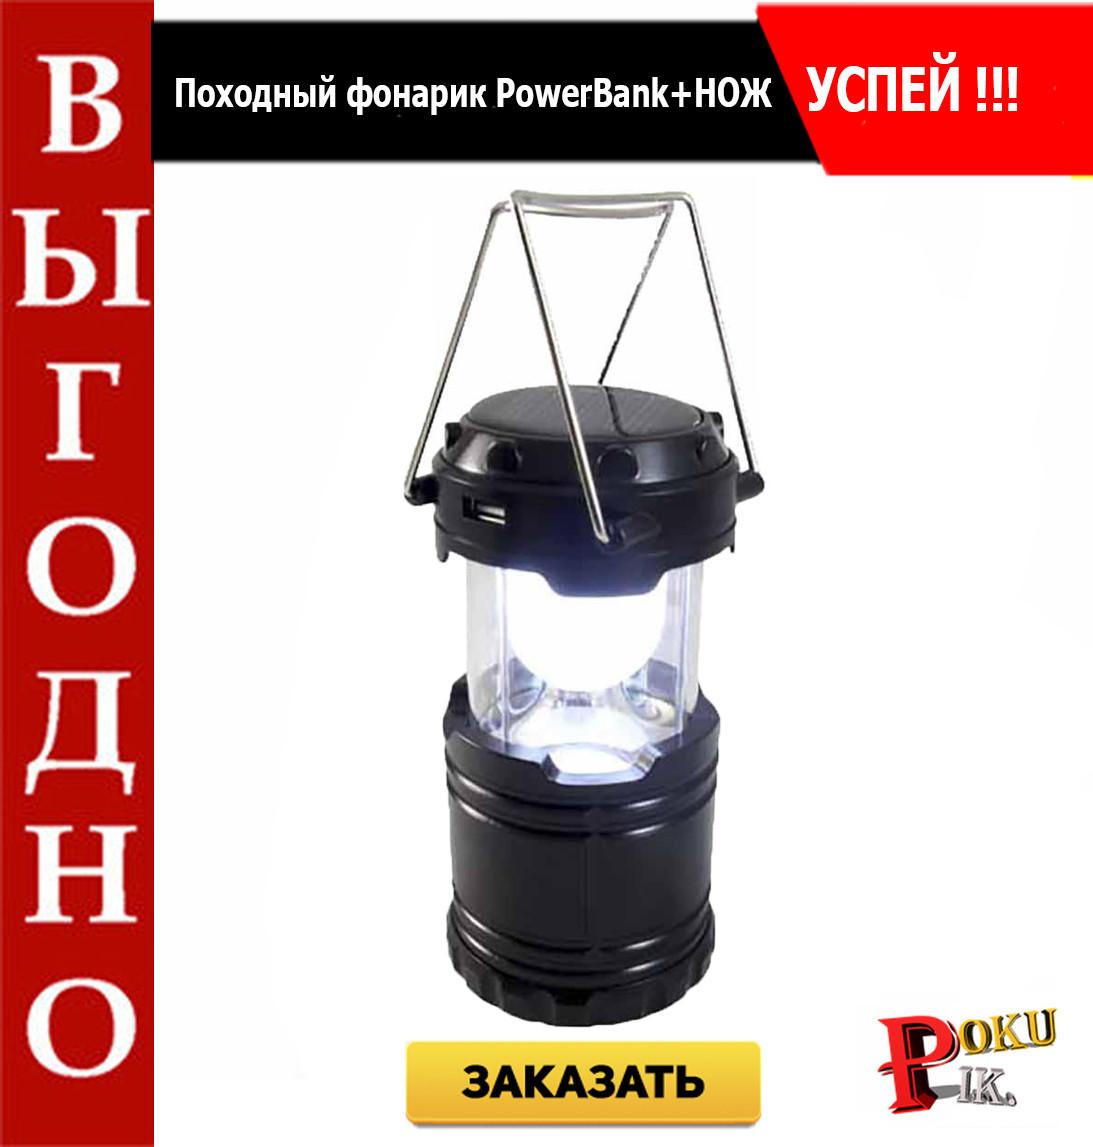 Походный фонарик PowerBank G85+solar